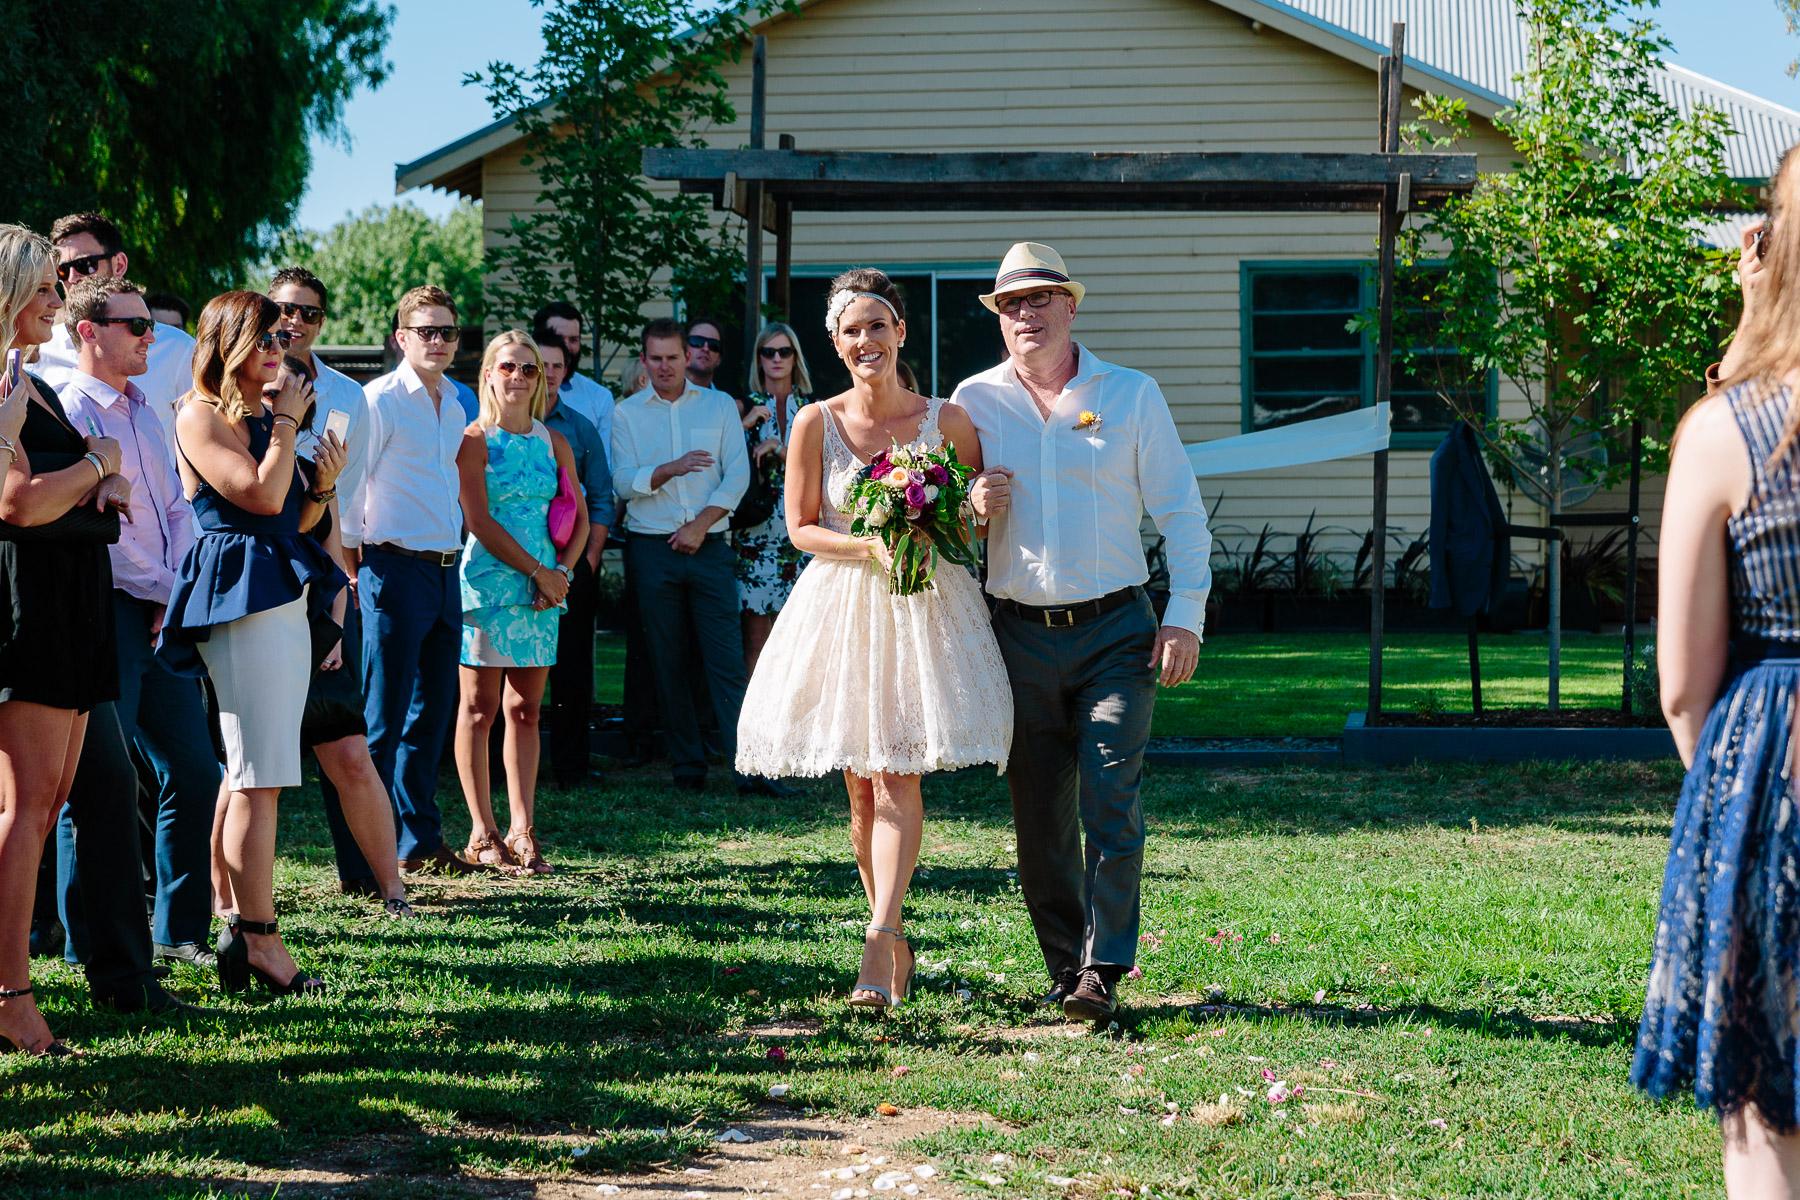 Melissa_and_Kristan_Echuca_Farm_Wedding_New_Years_Eve-58.jpg